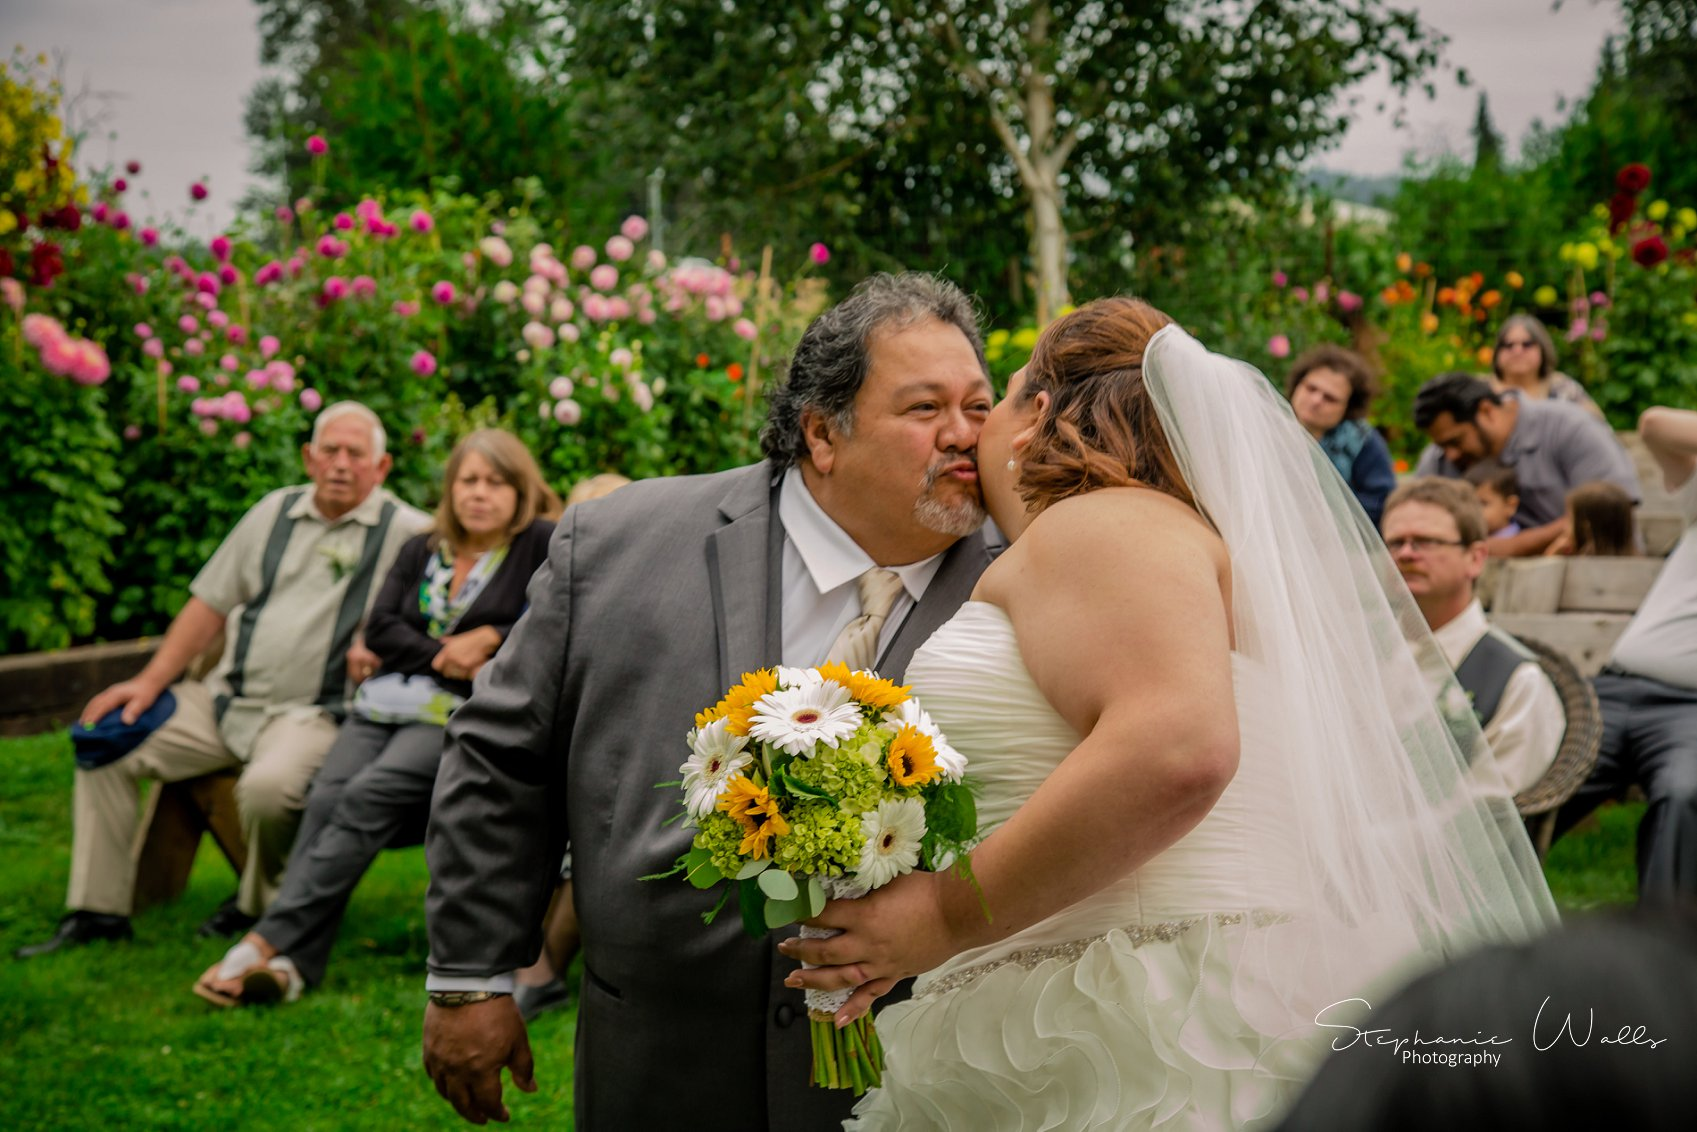 Kimble Wedding 162 Marlena & Allans | Snohomish Red Barn Events (Stocker Farms) | Snohomish, Wa Wedding Photographer